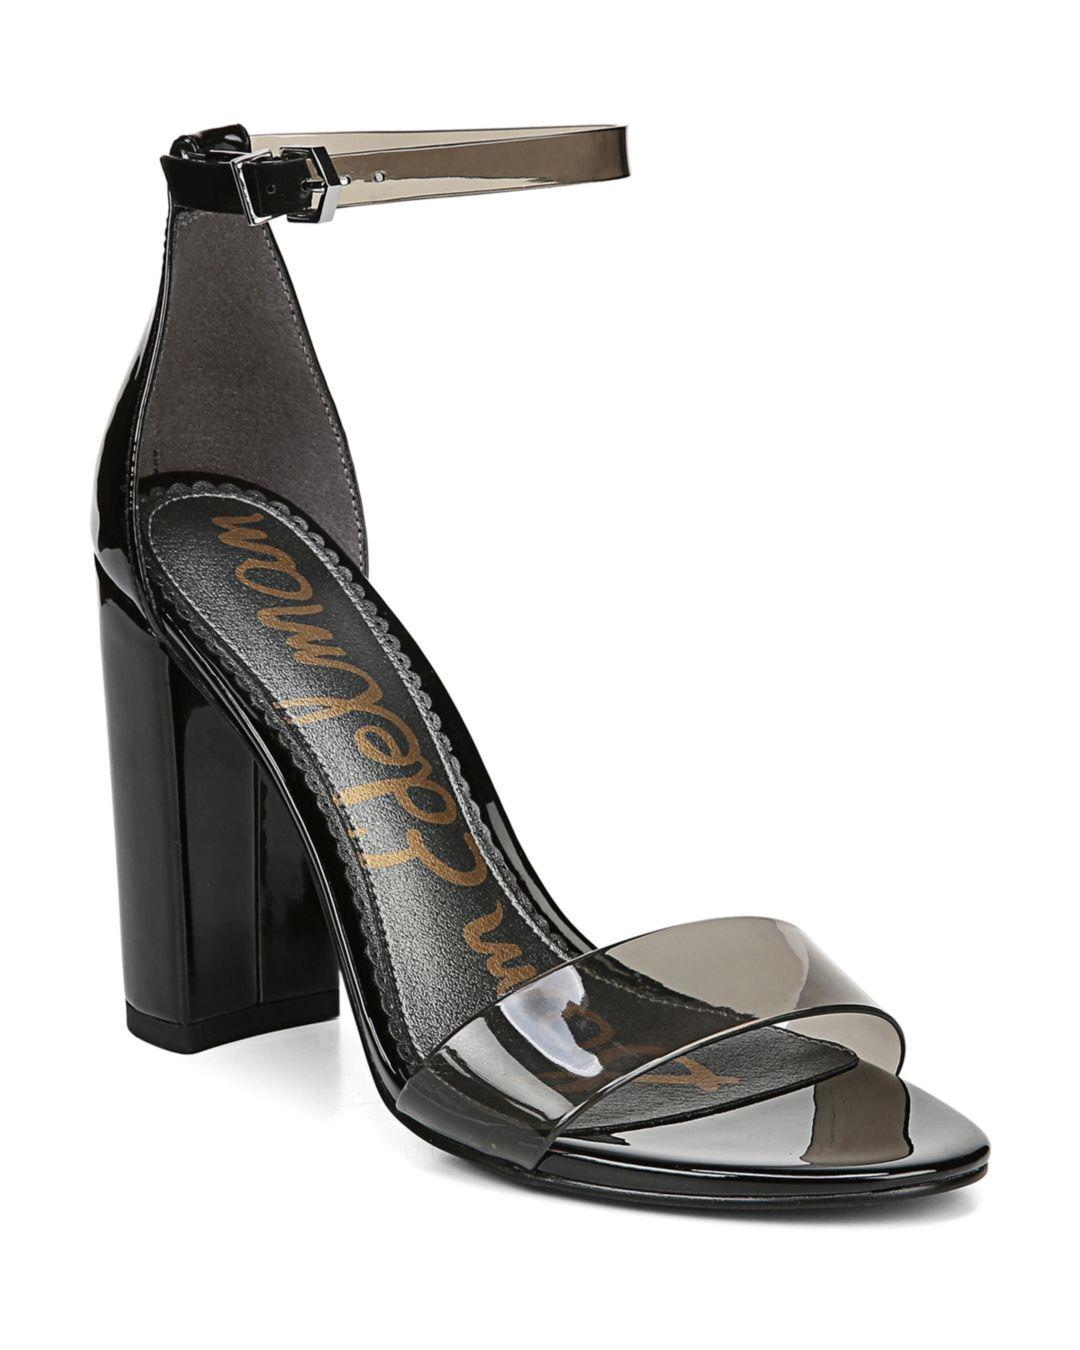 13e1f8a00a1 Sam Edelman Women s Yaro Ankle Strap Block Heel Sandals in Black ...